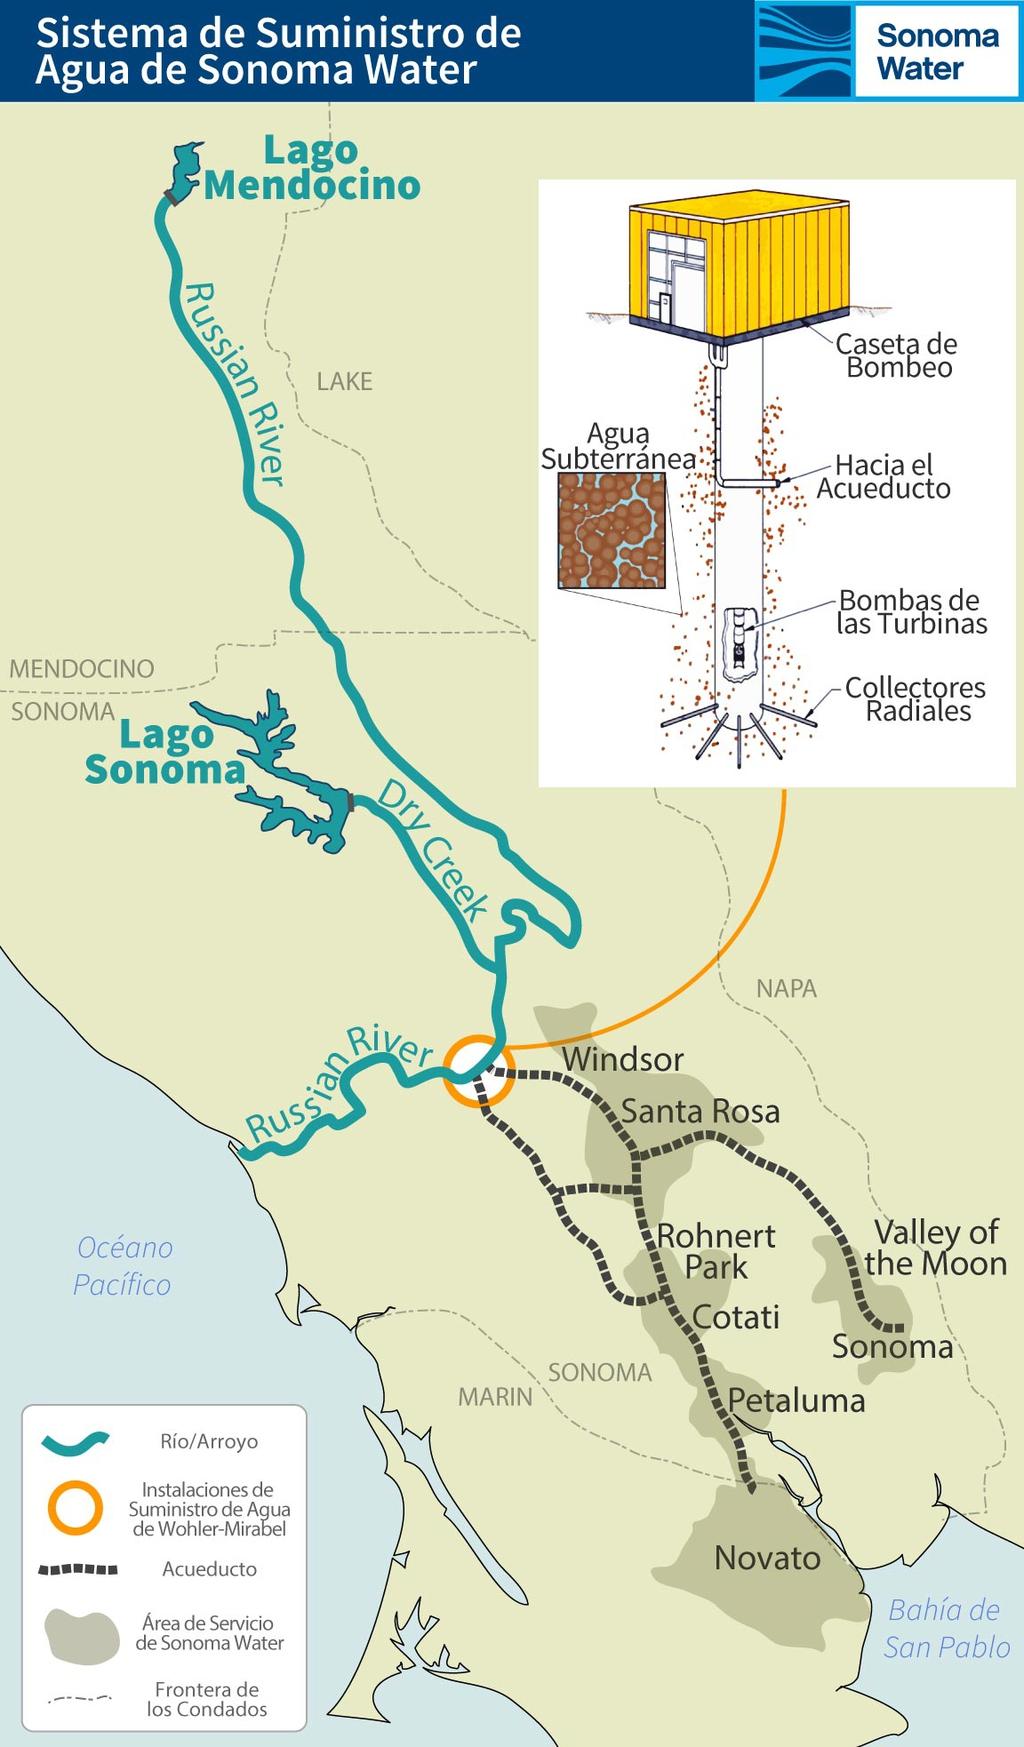 Sistema de Suministro de  Agua de Sonoma Water